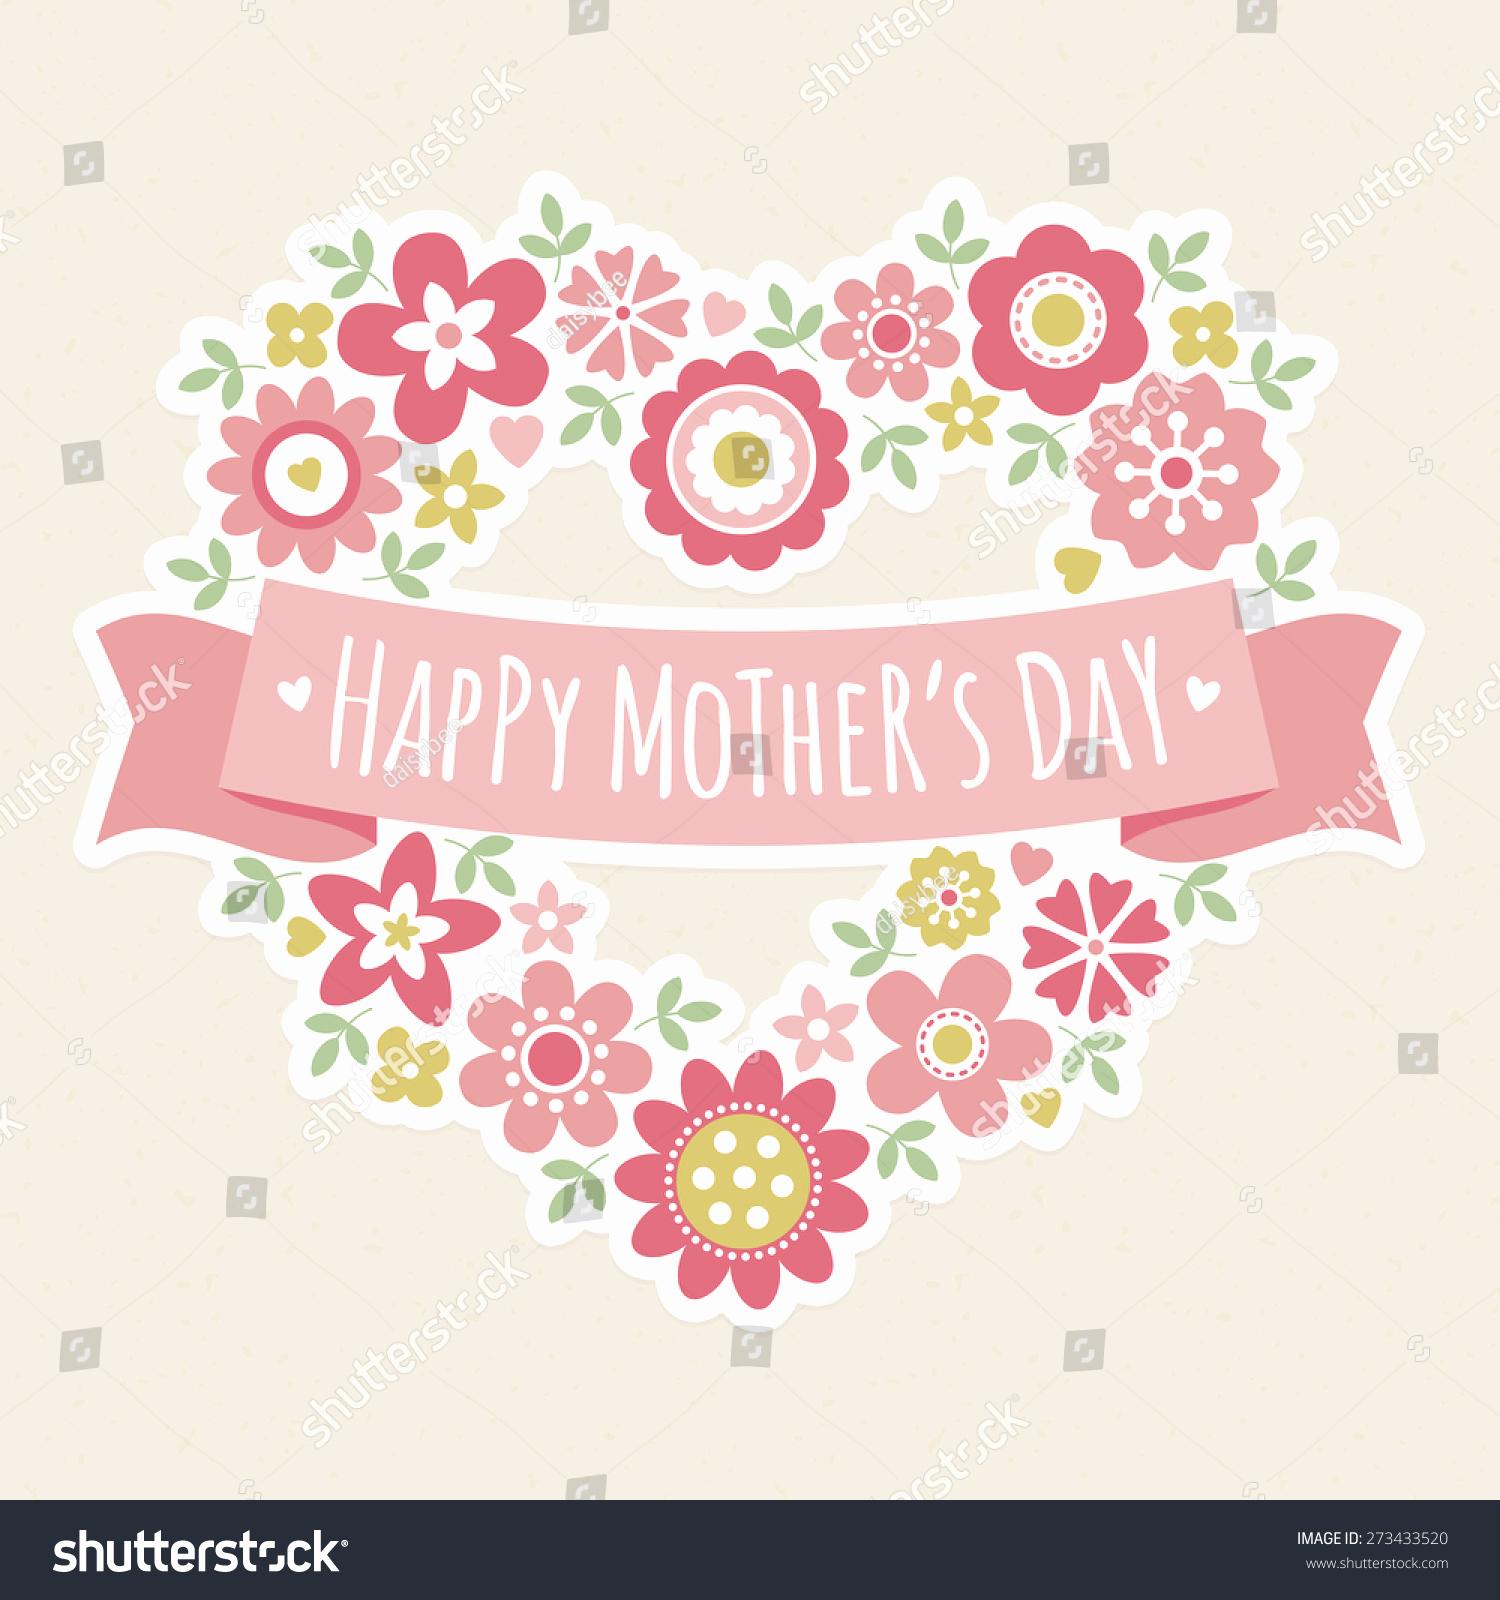 Mothers Day Menu Template Fresh Pretty Greeting Card Menu Template for Mother S Day